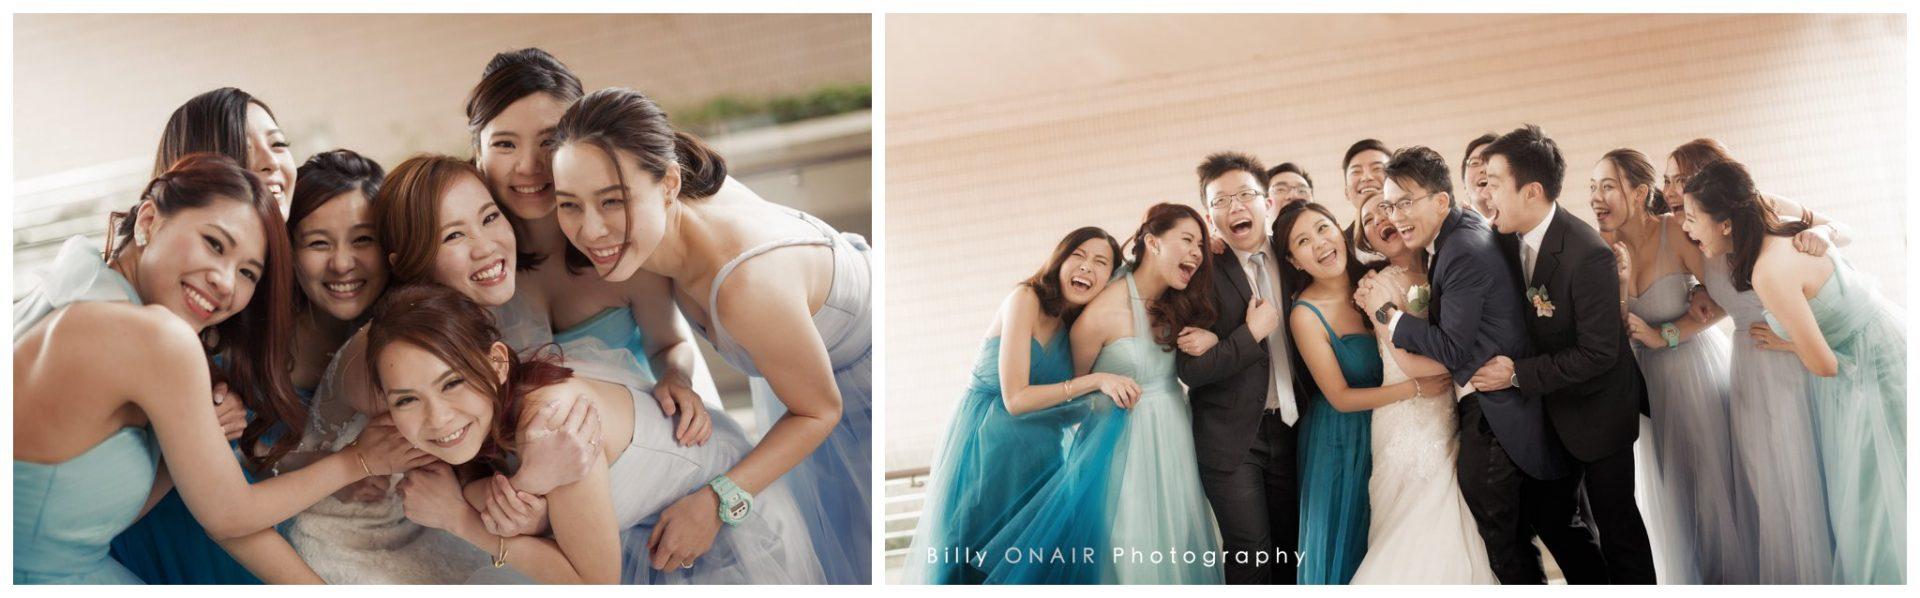 billy_wedding_photography_020